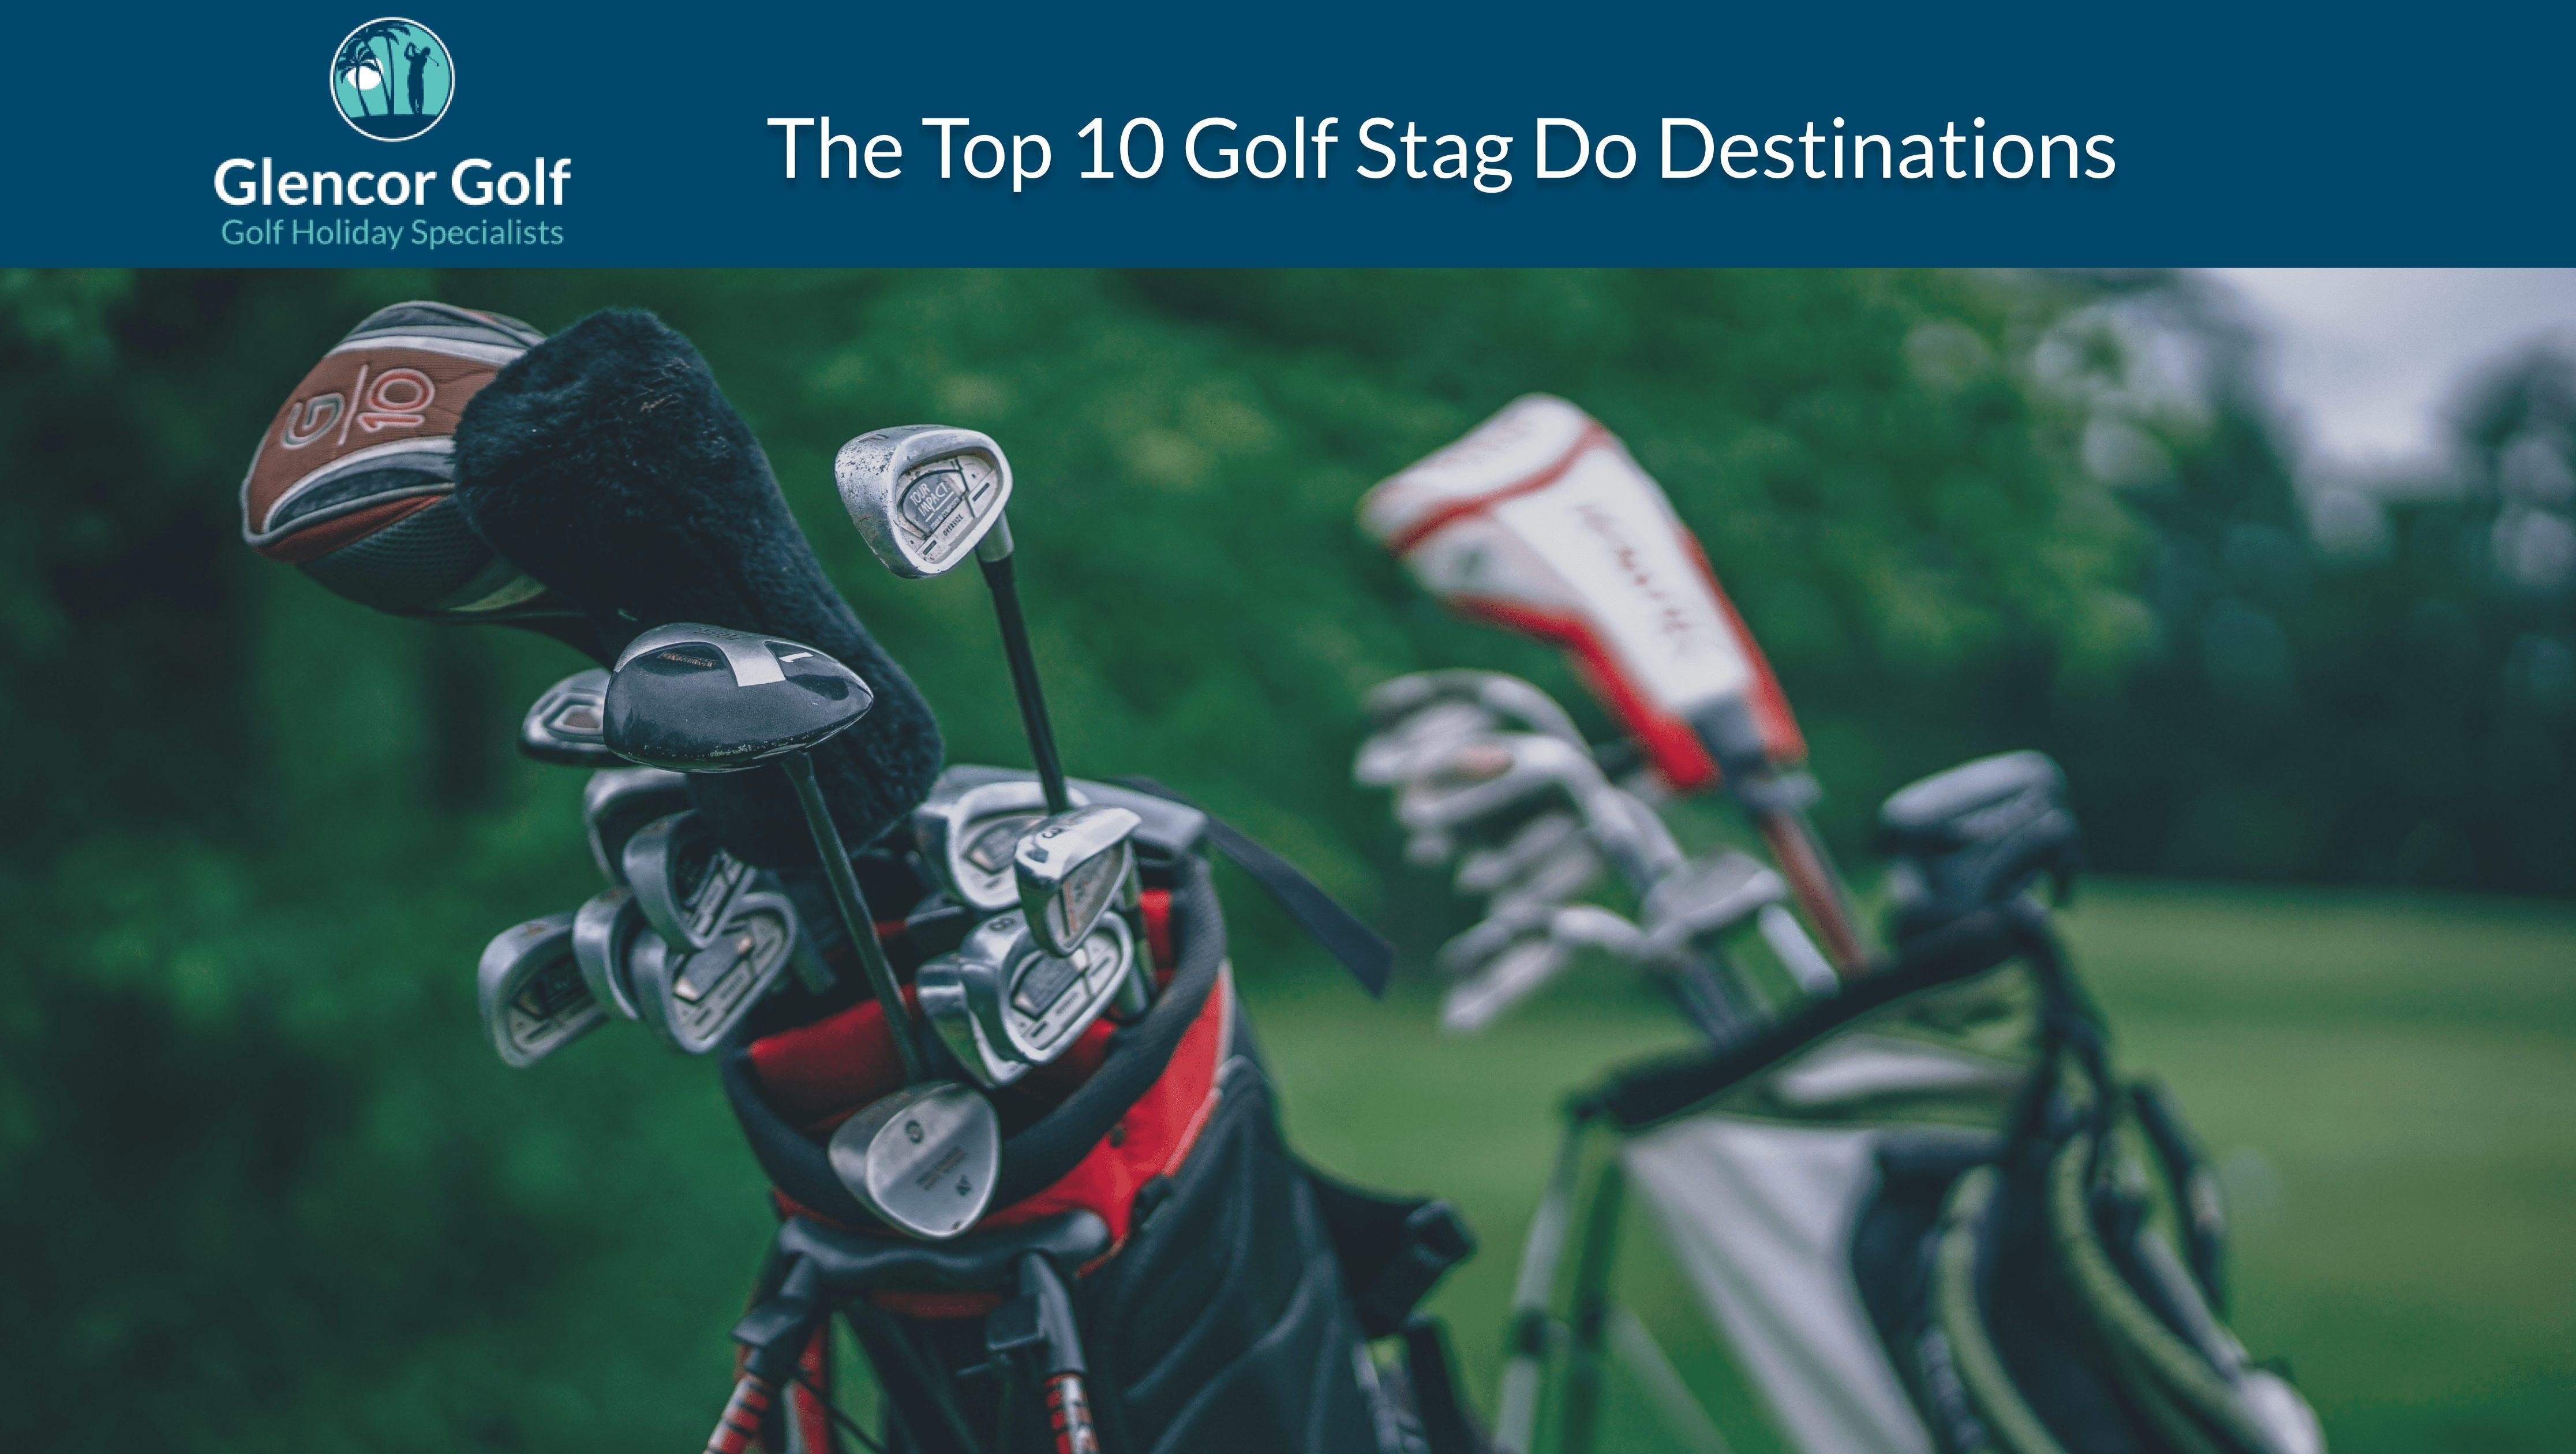 Golf stag do header